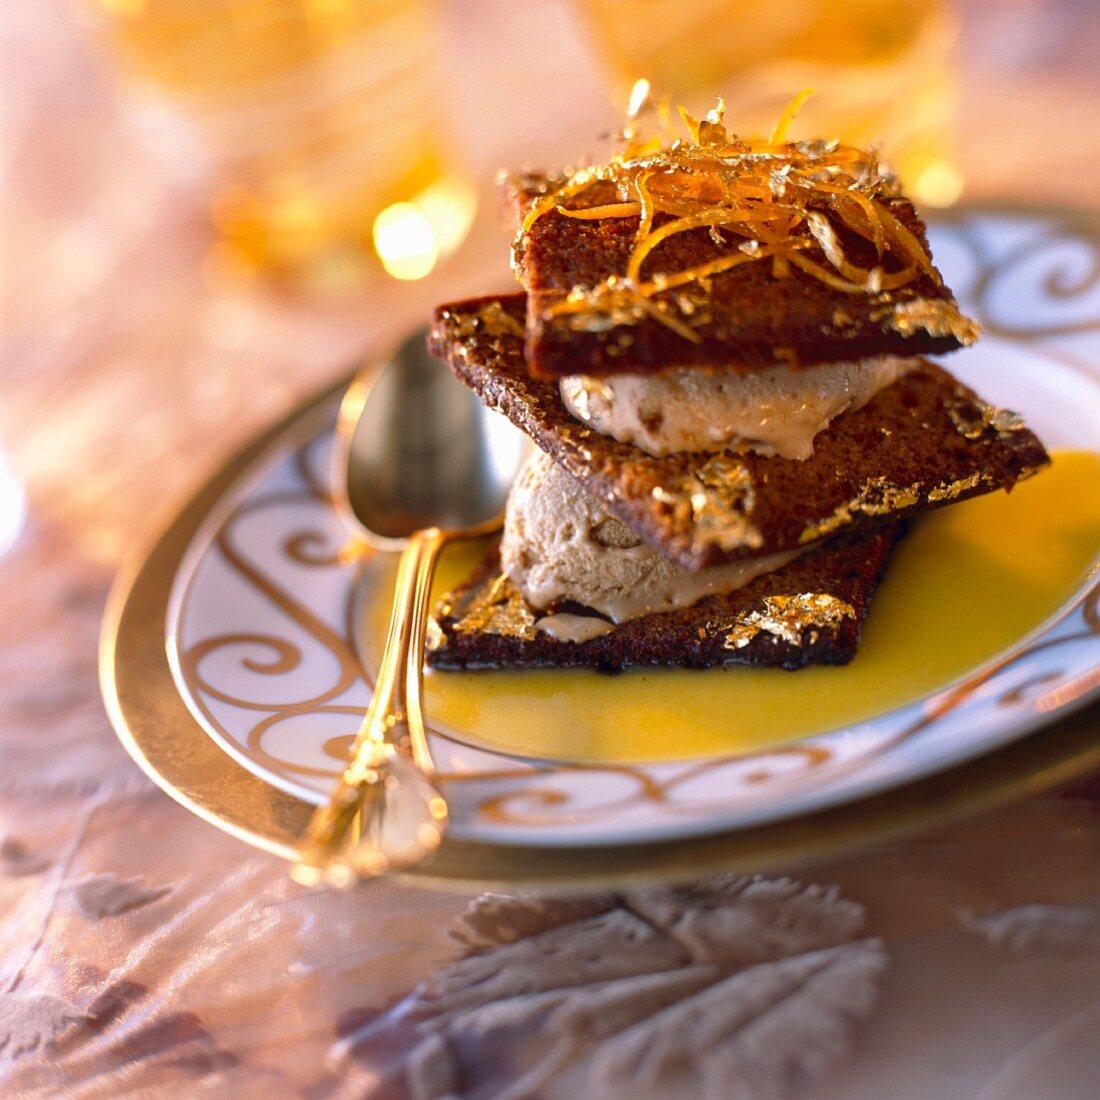 Gingerbread and orange layered dessert